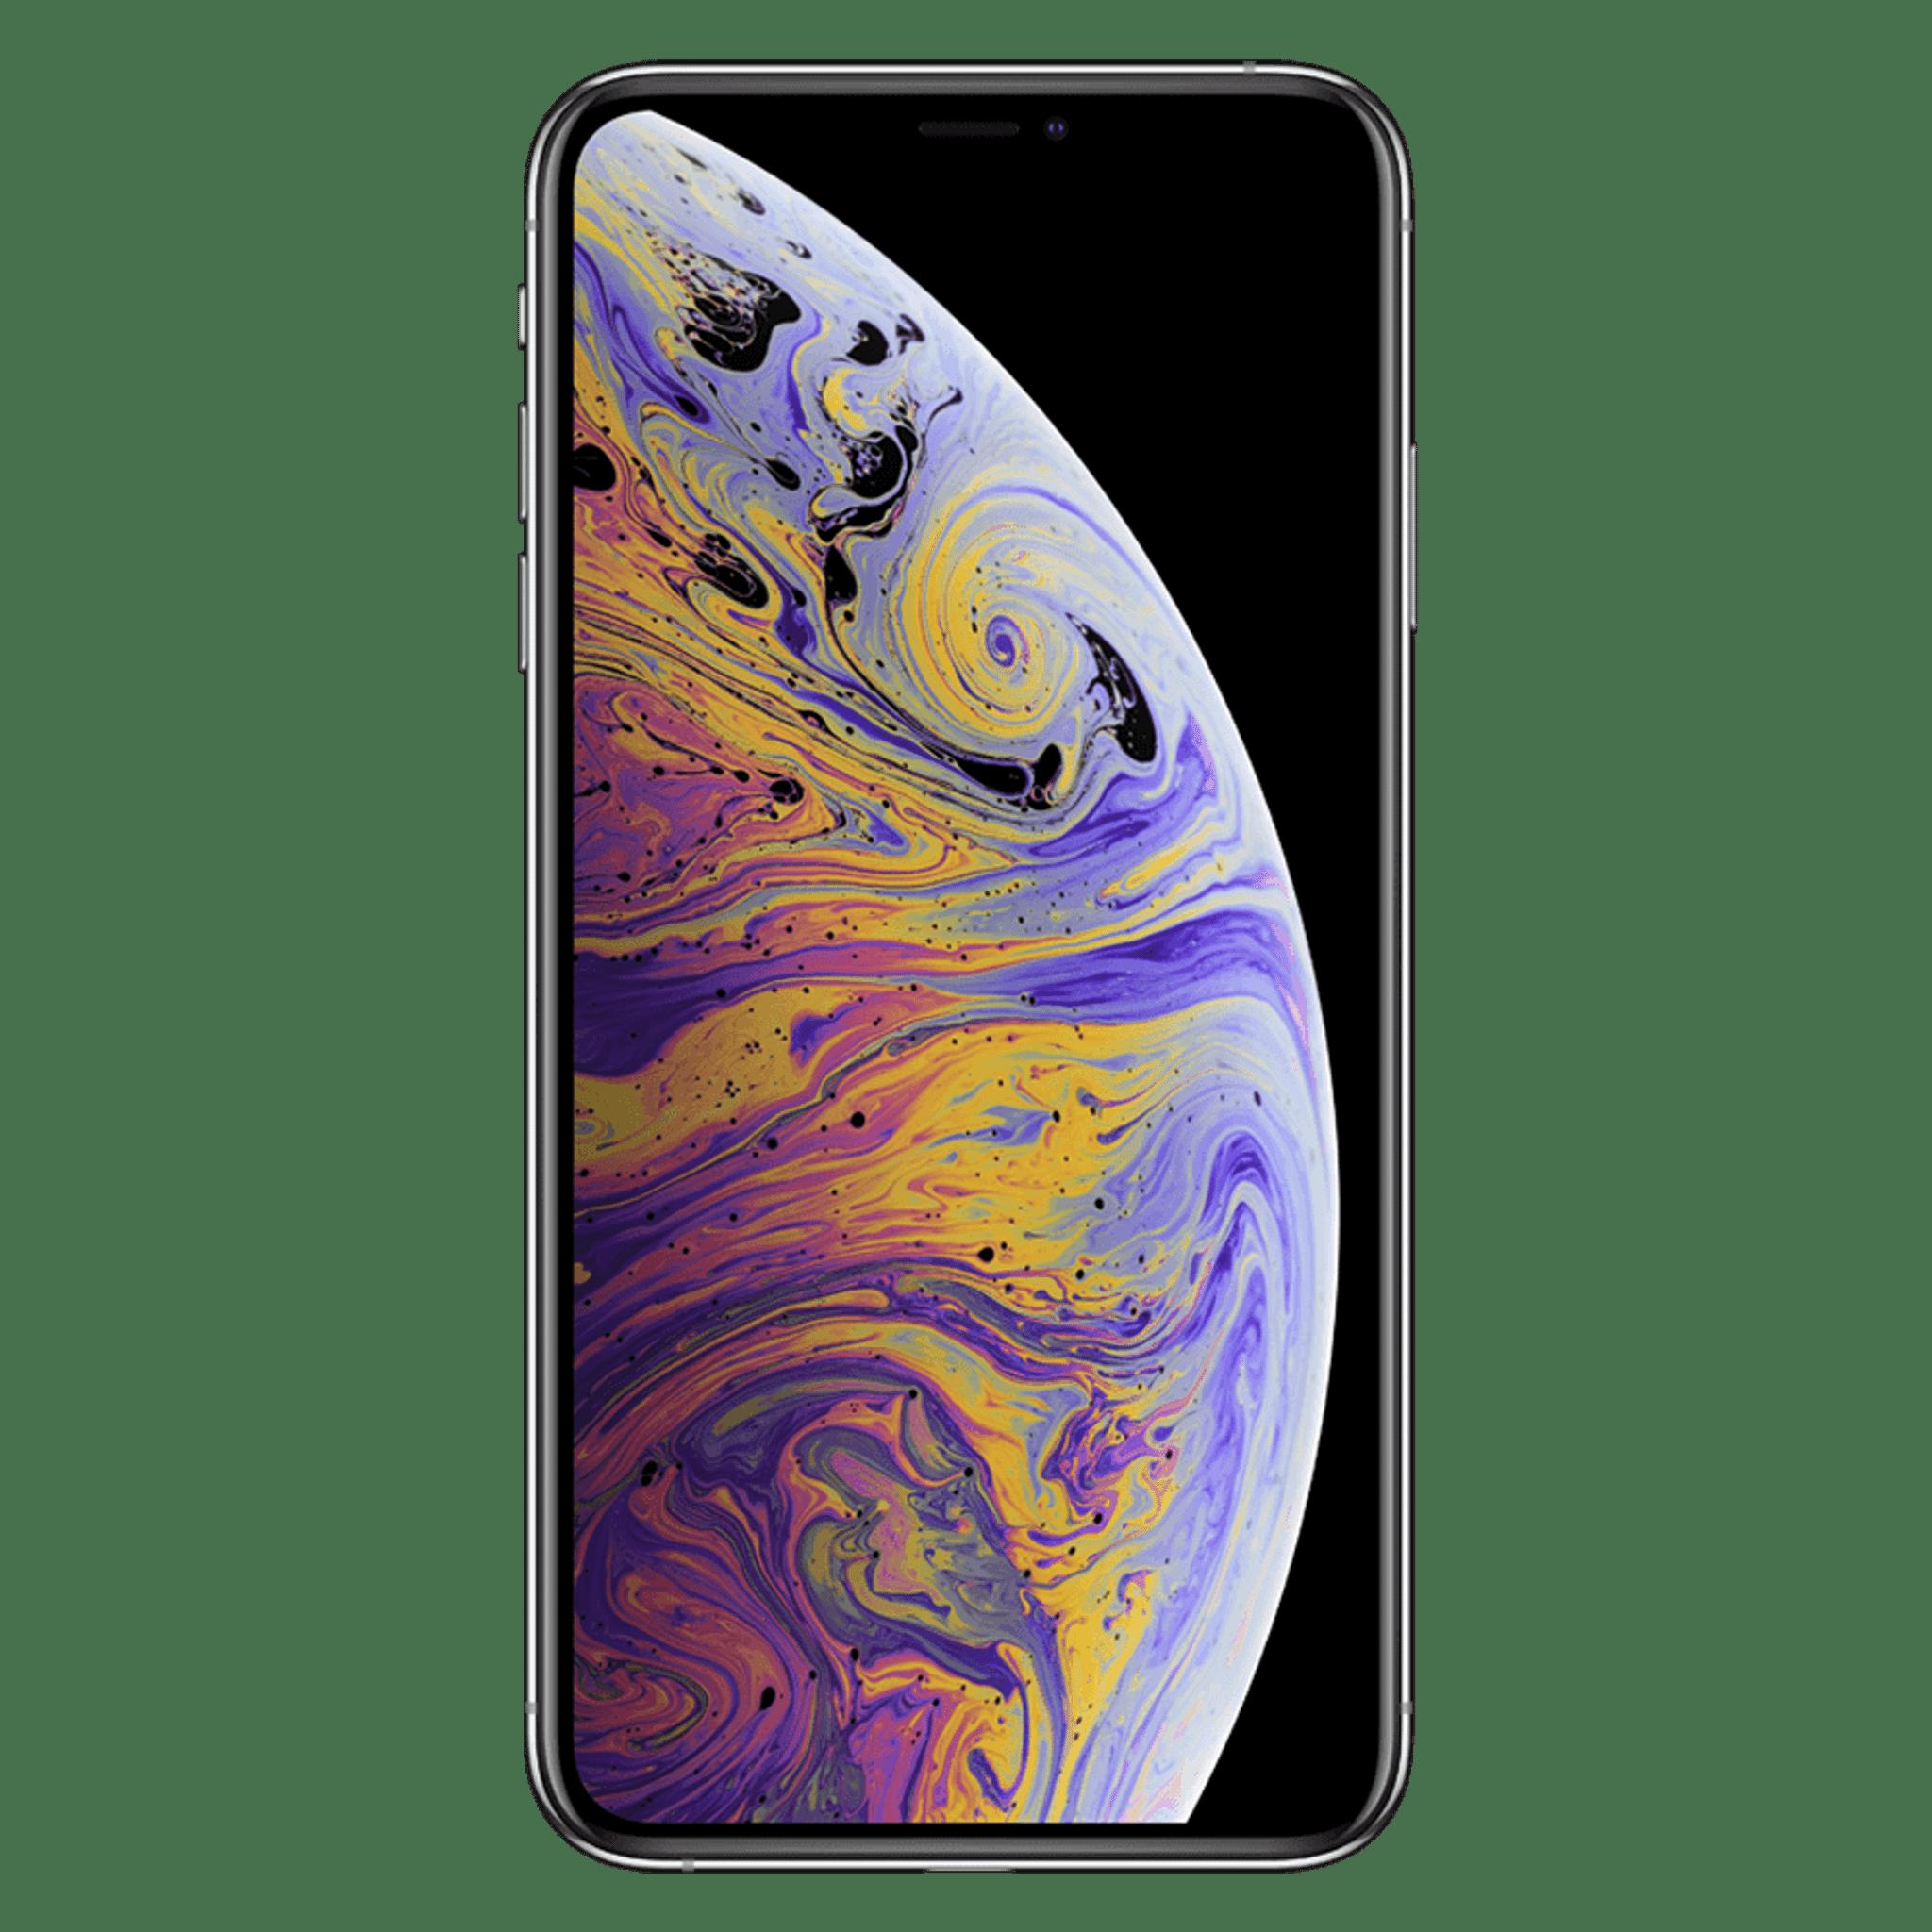 huge discount 4b604 3e0cb iPhone Xs Max 512GB